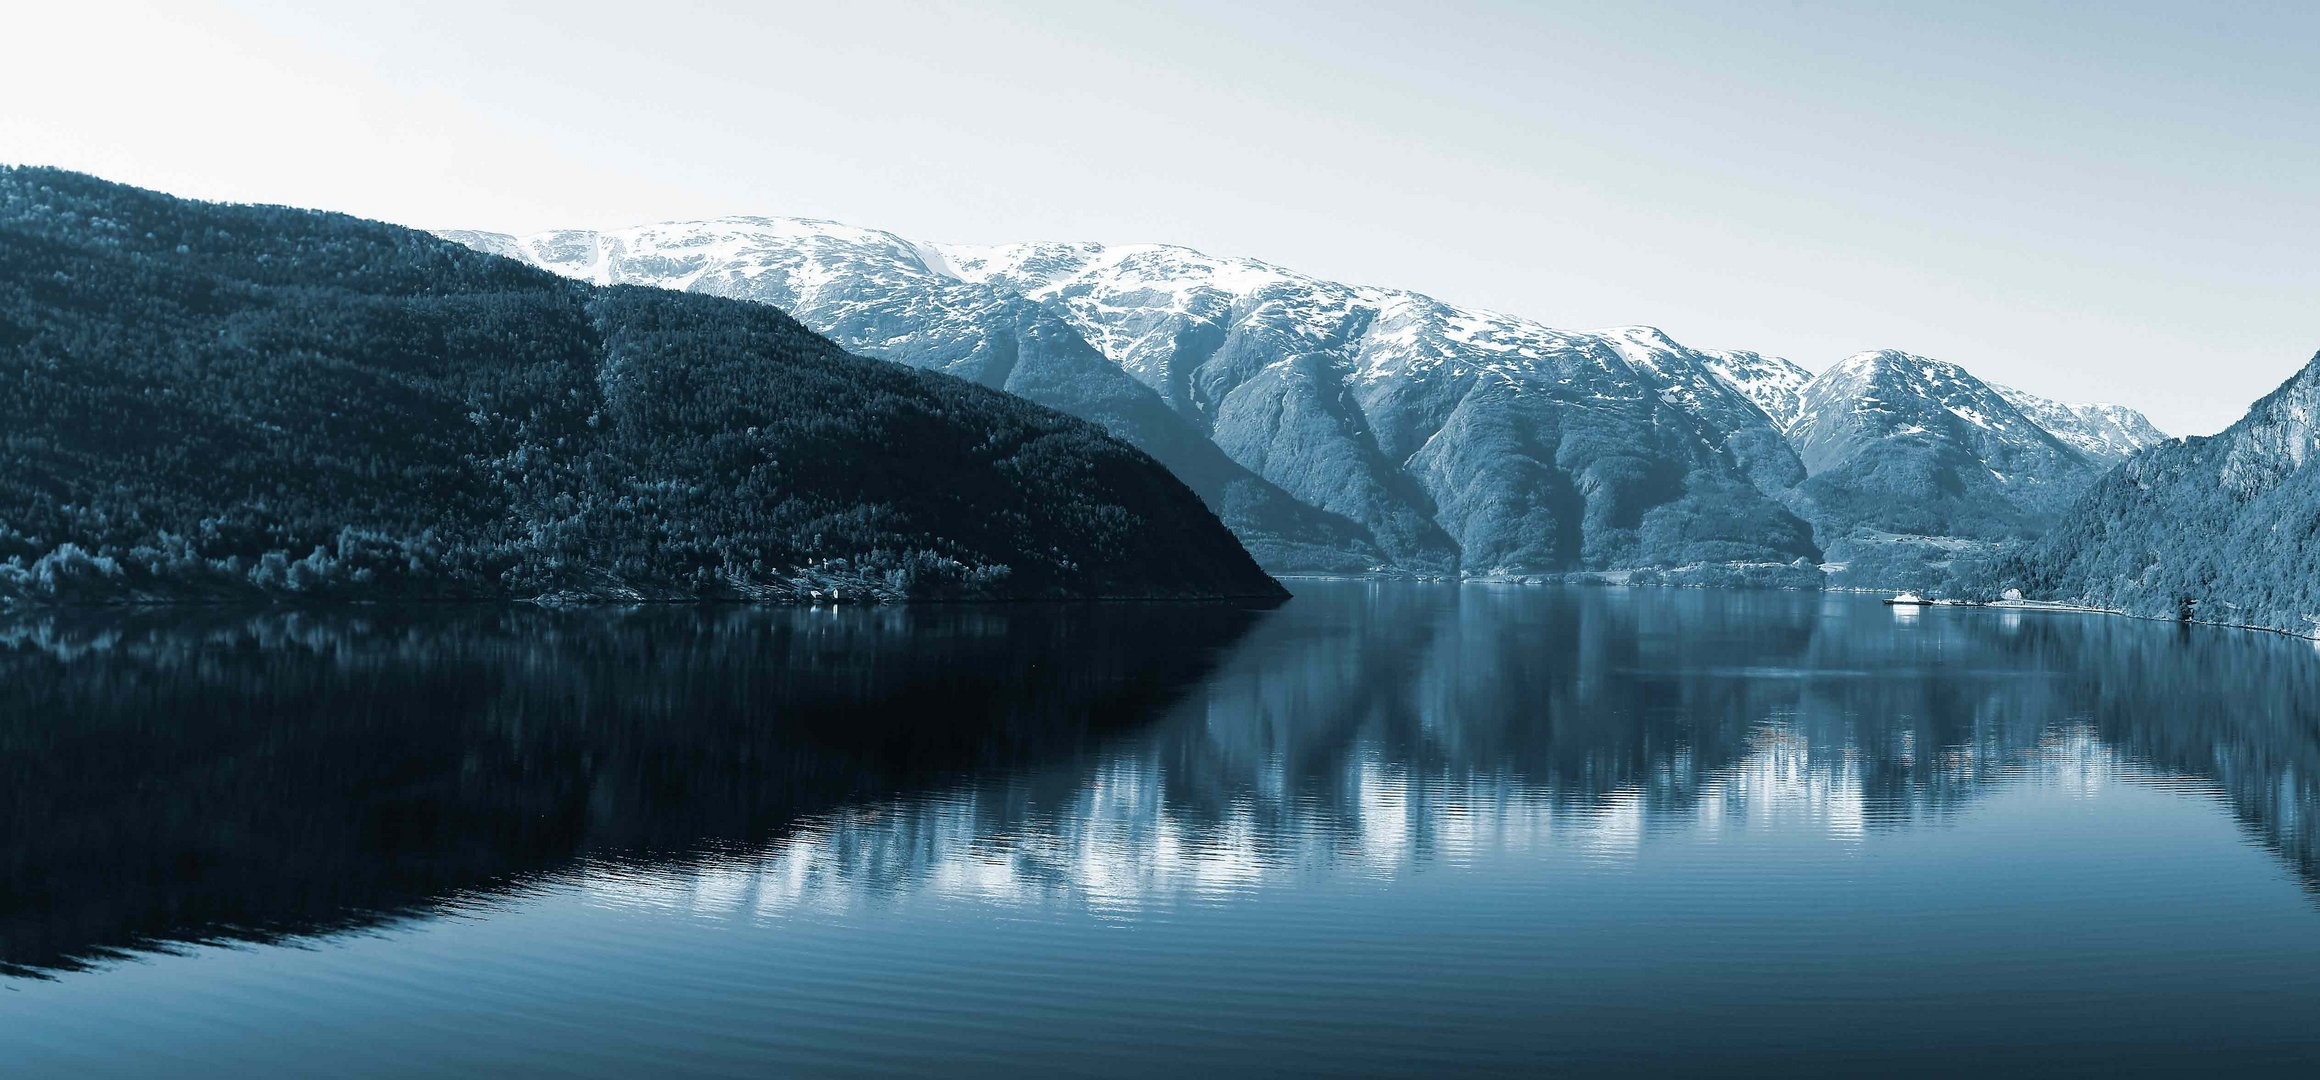 Auf dem Weg zum Eidfjord II